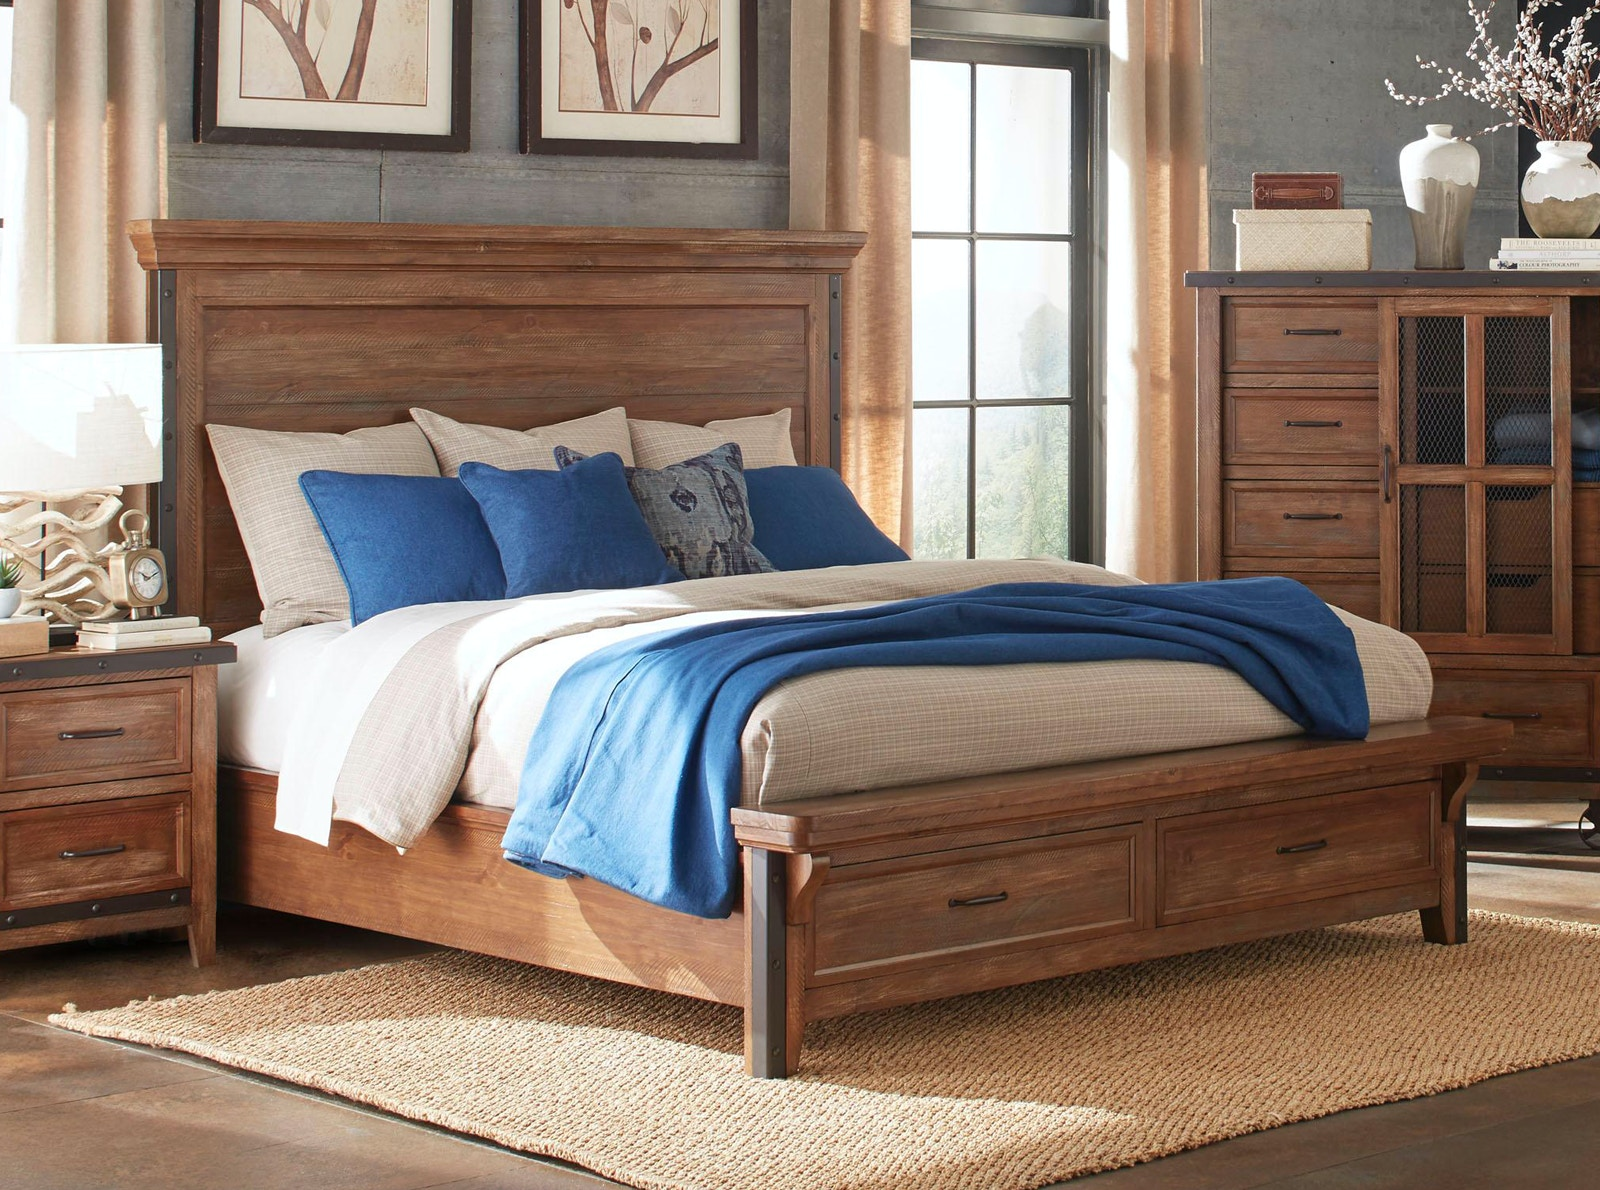 intercon bedroom taos storage bed queen 832068 furniture fair